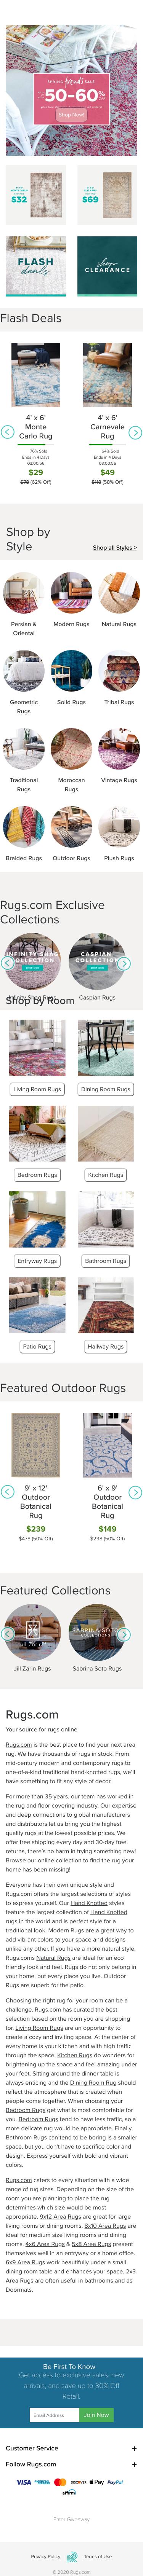 Rugs.com Coupon